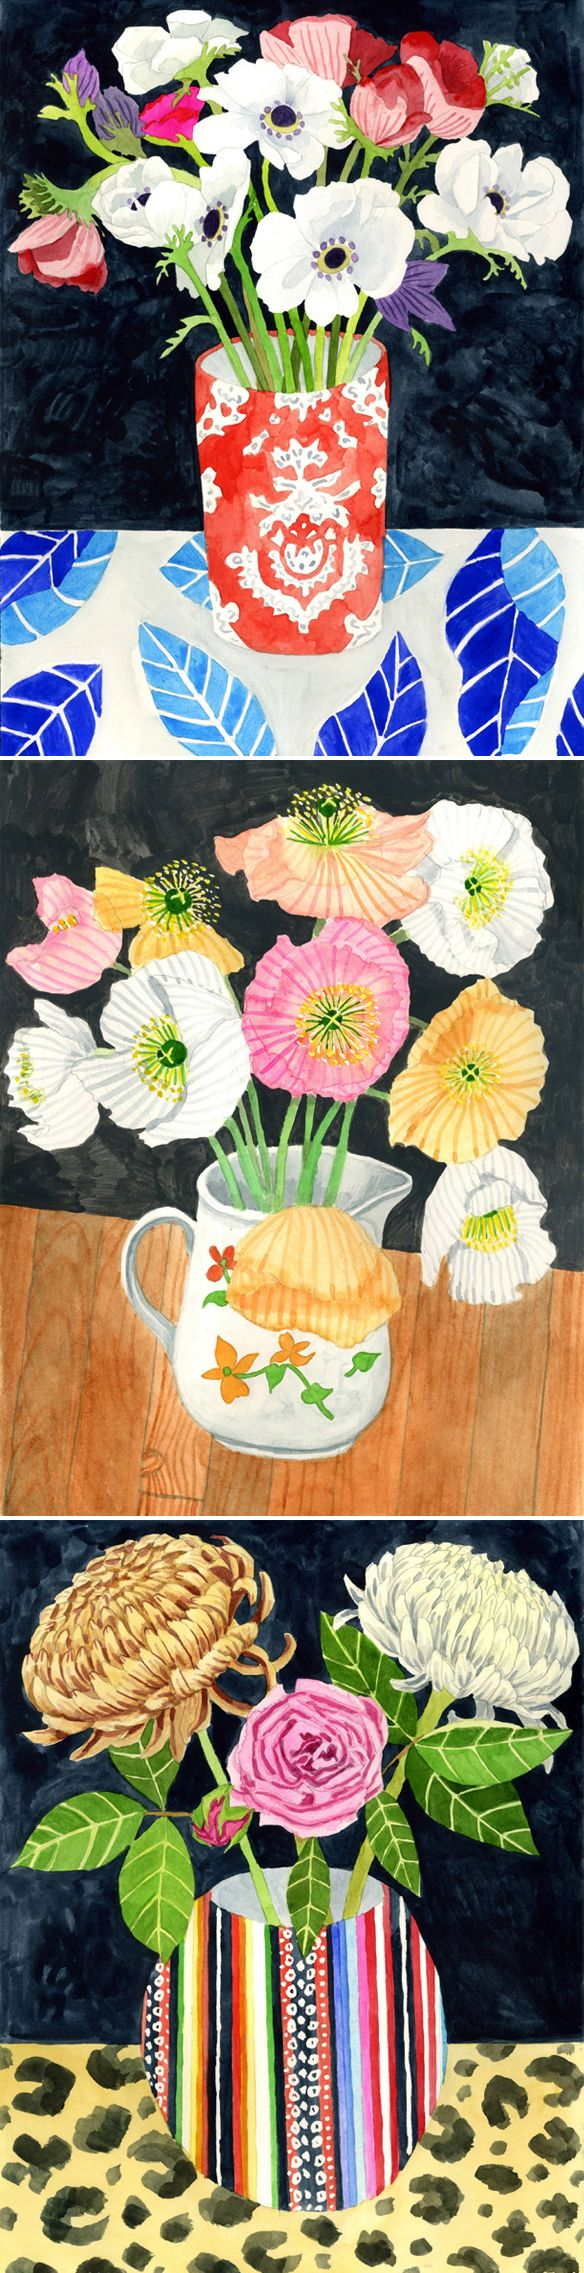 emily proud - watercolor